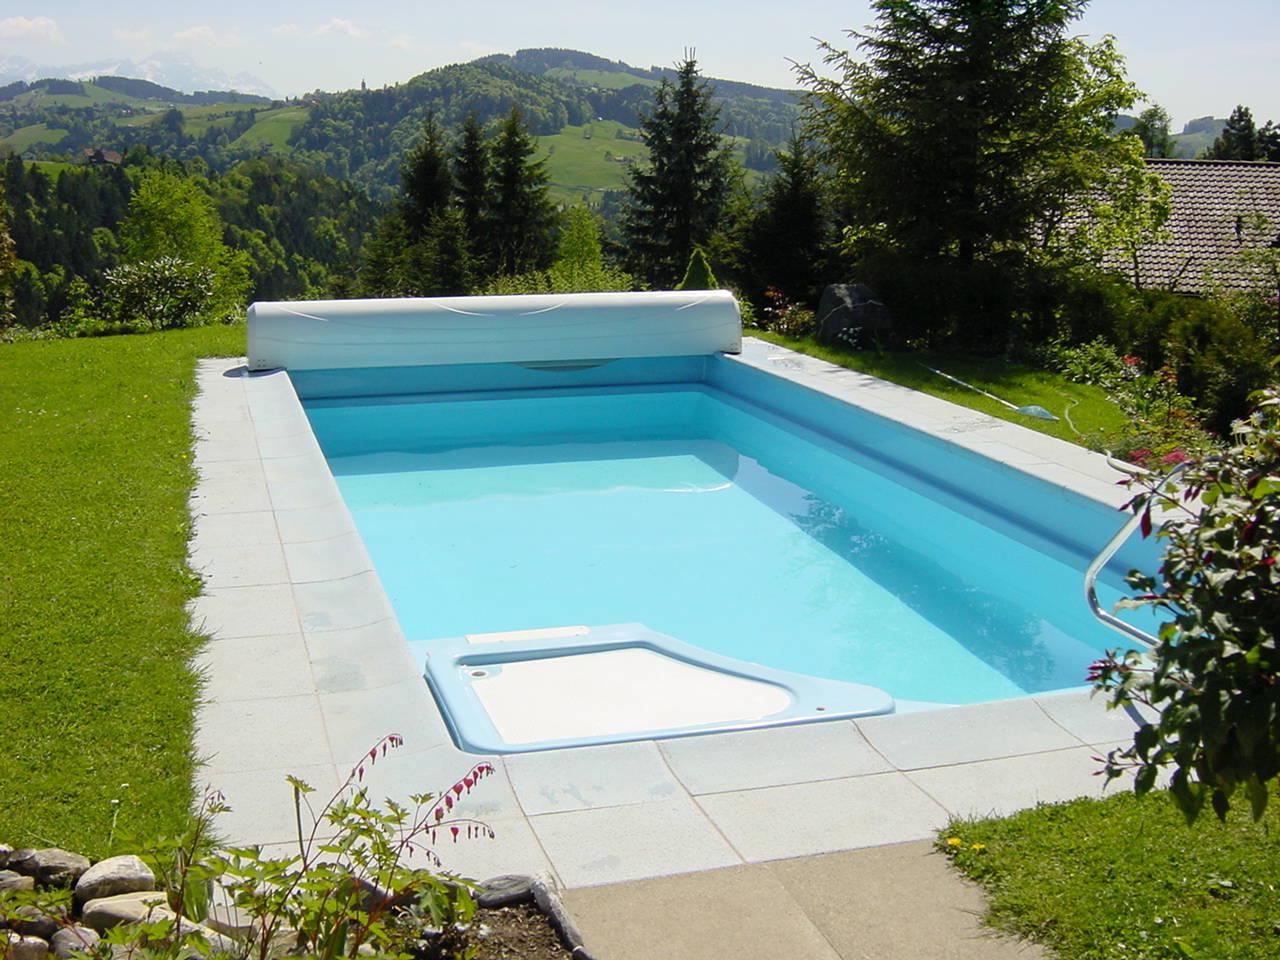 Fertig pools aus kunststoff ibatec ag for Fertigbecken pool